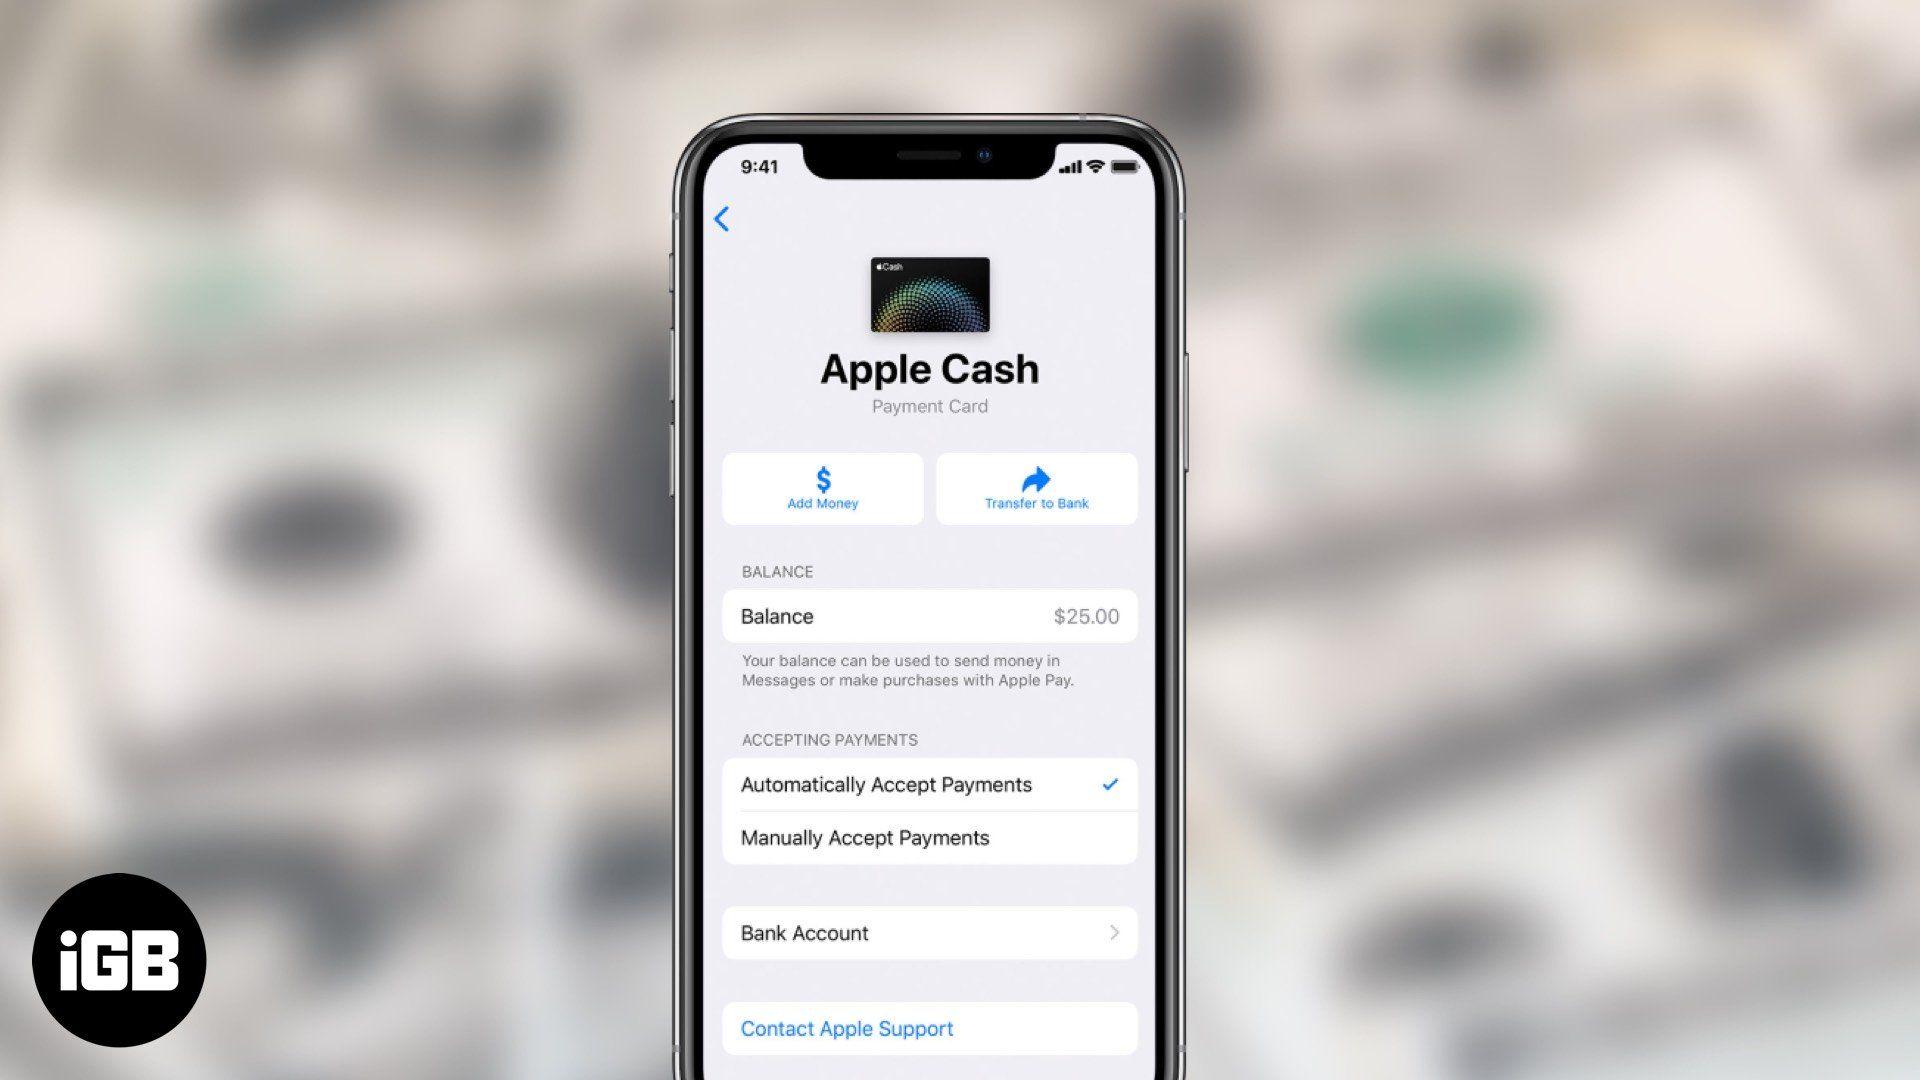 How To Transfer Apple Cash To Bank Account Or Debit Card Visa Debit Card Cash Card Instant Money